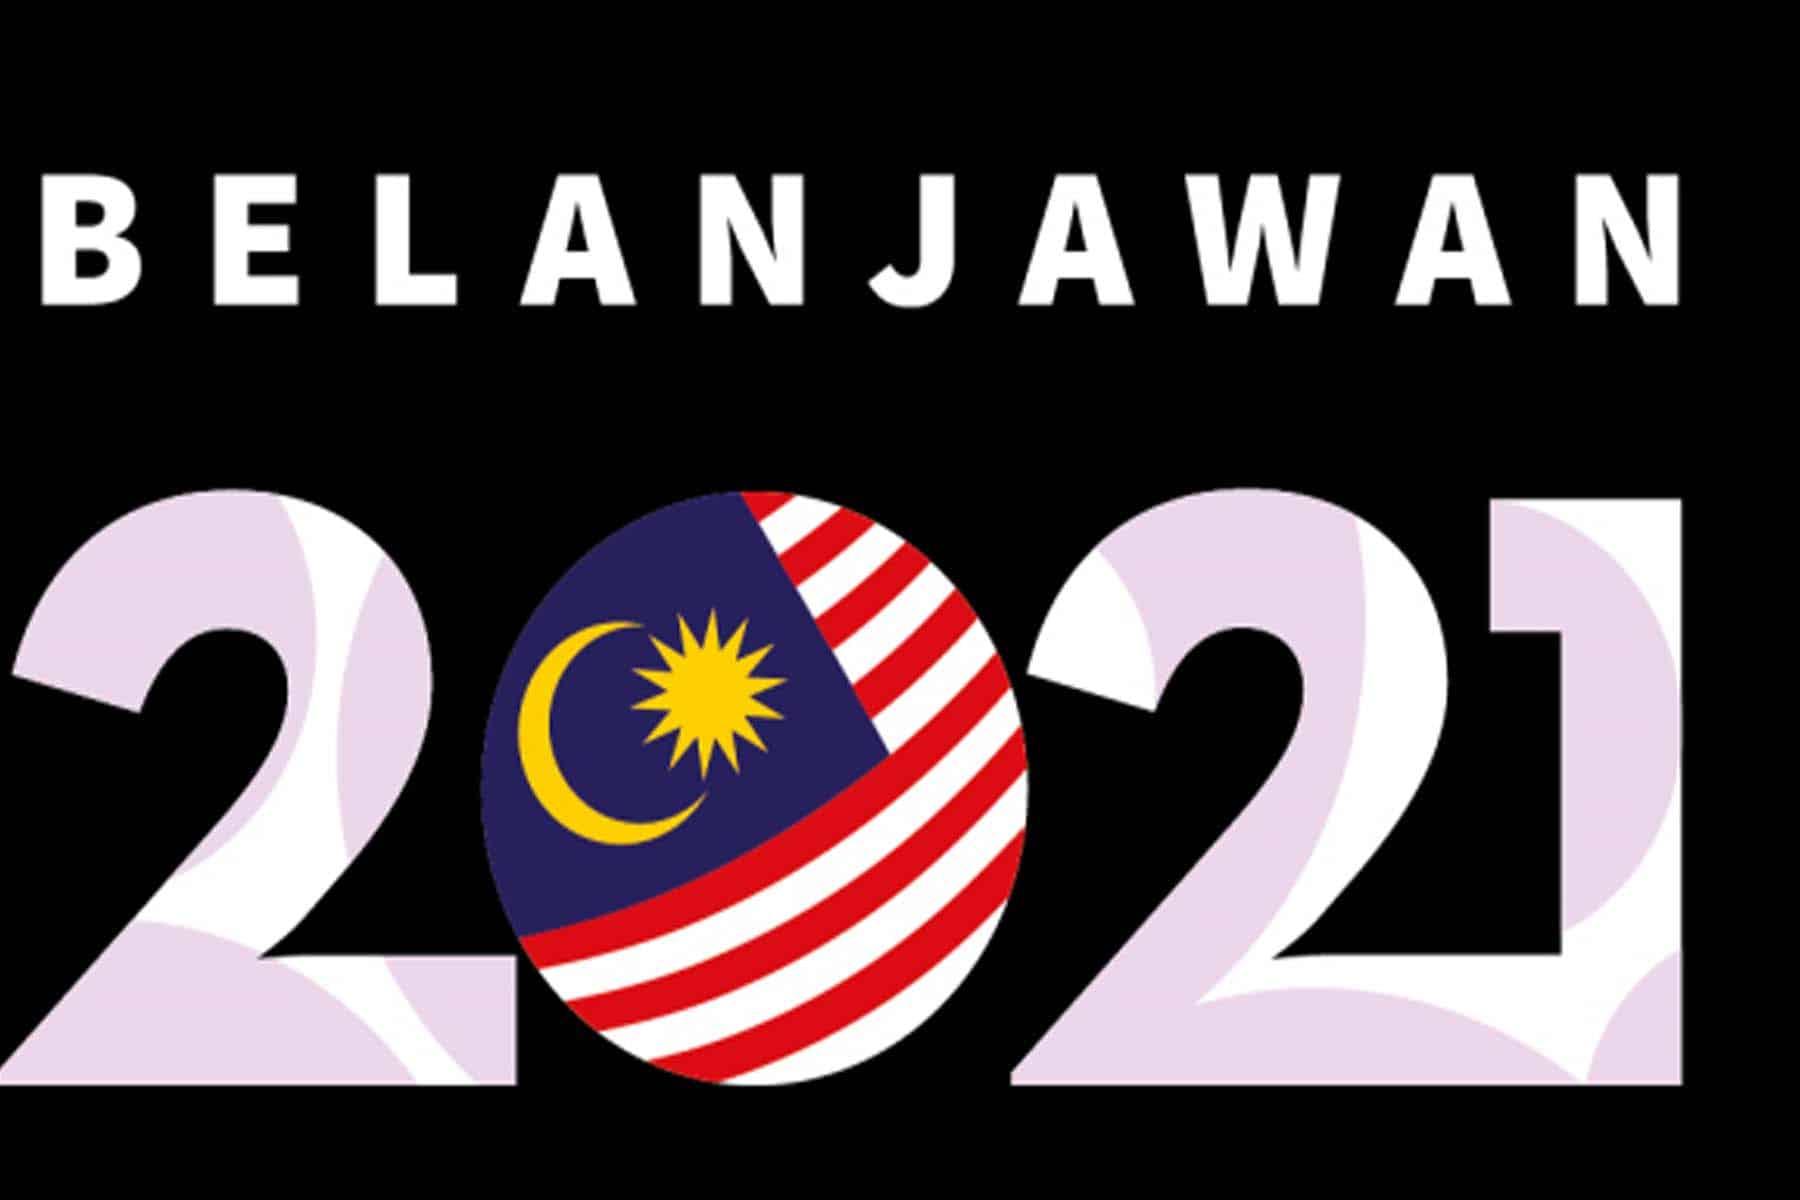 Kenapa budget 2021 wajib di tolak?